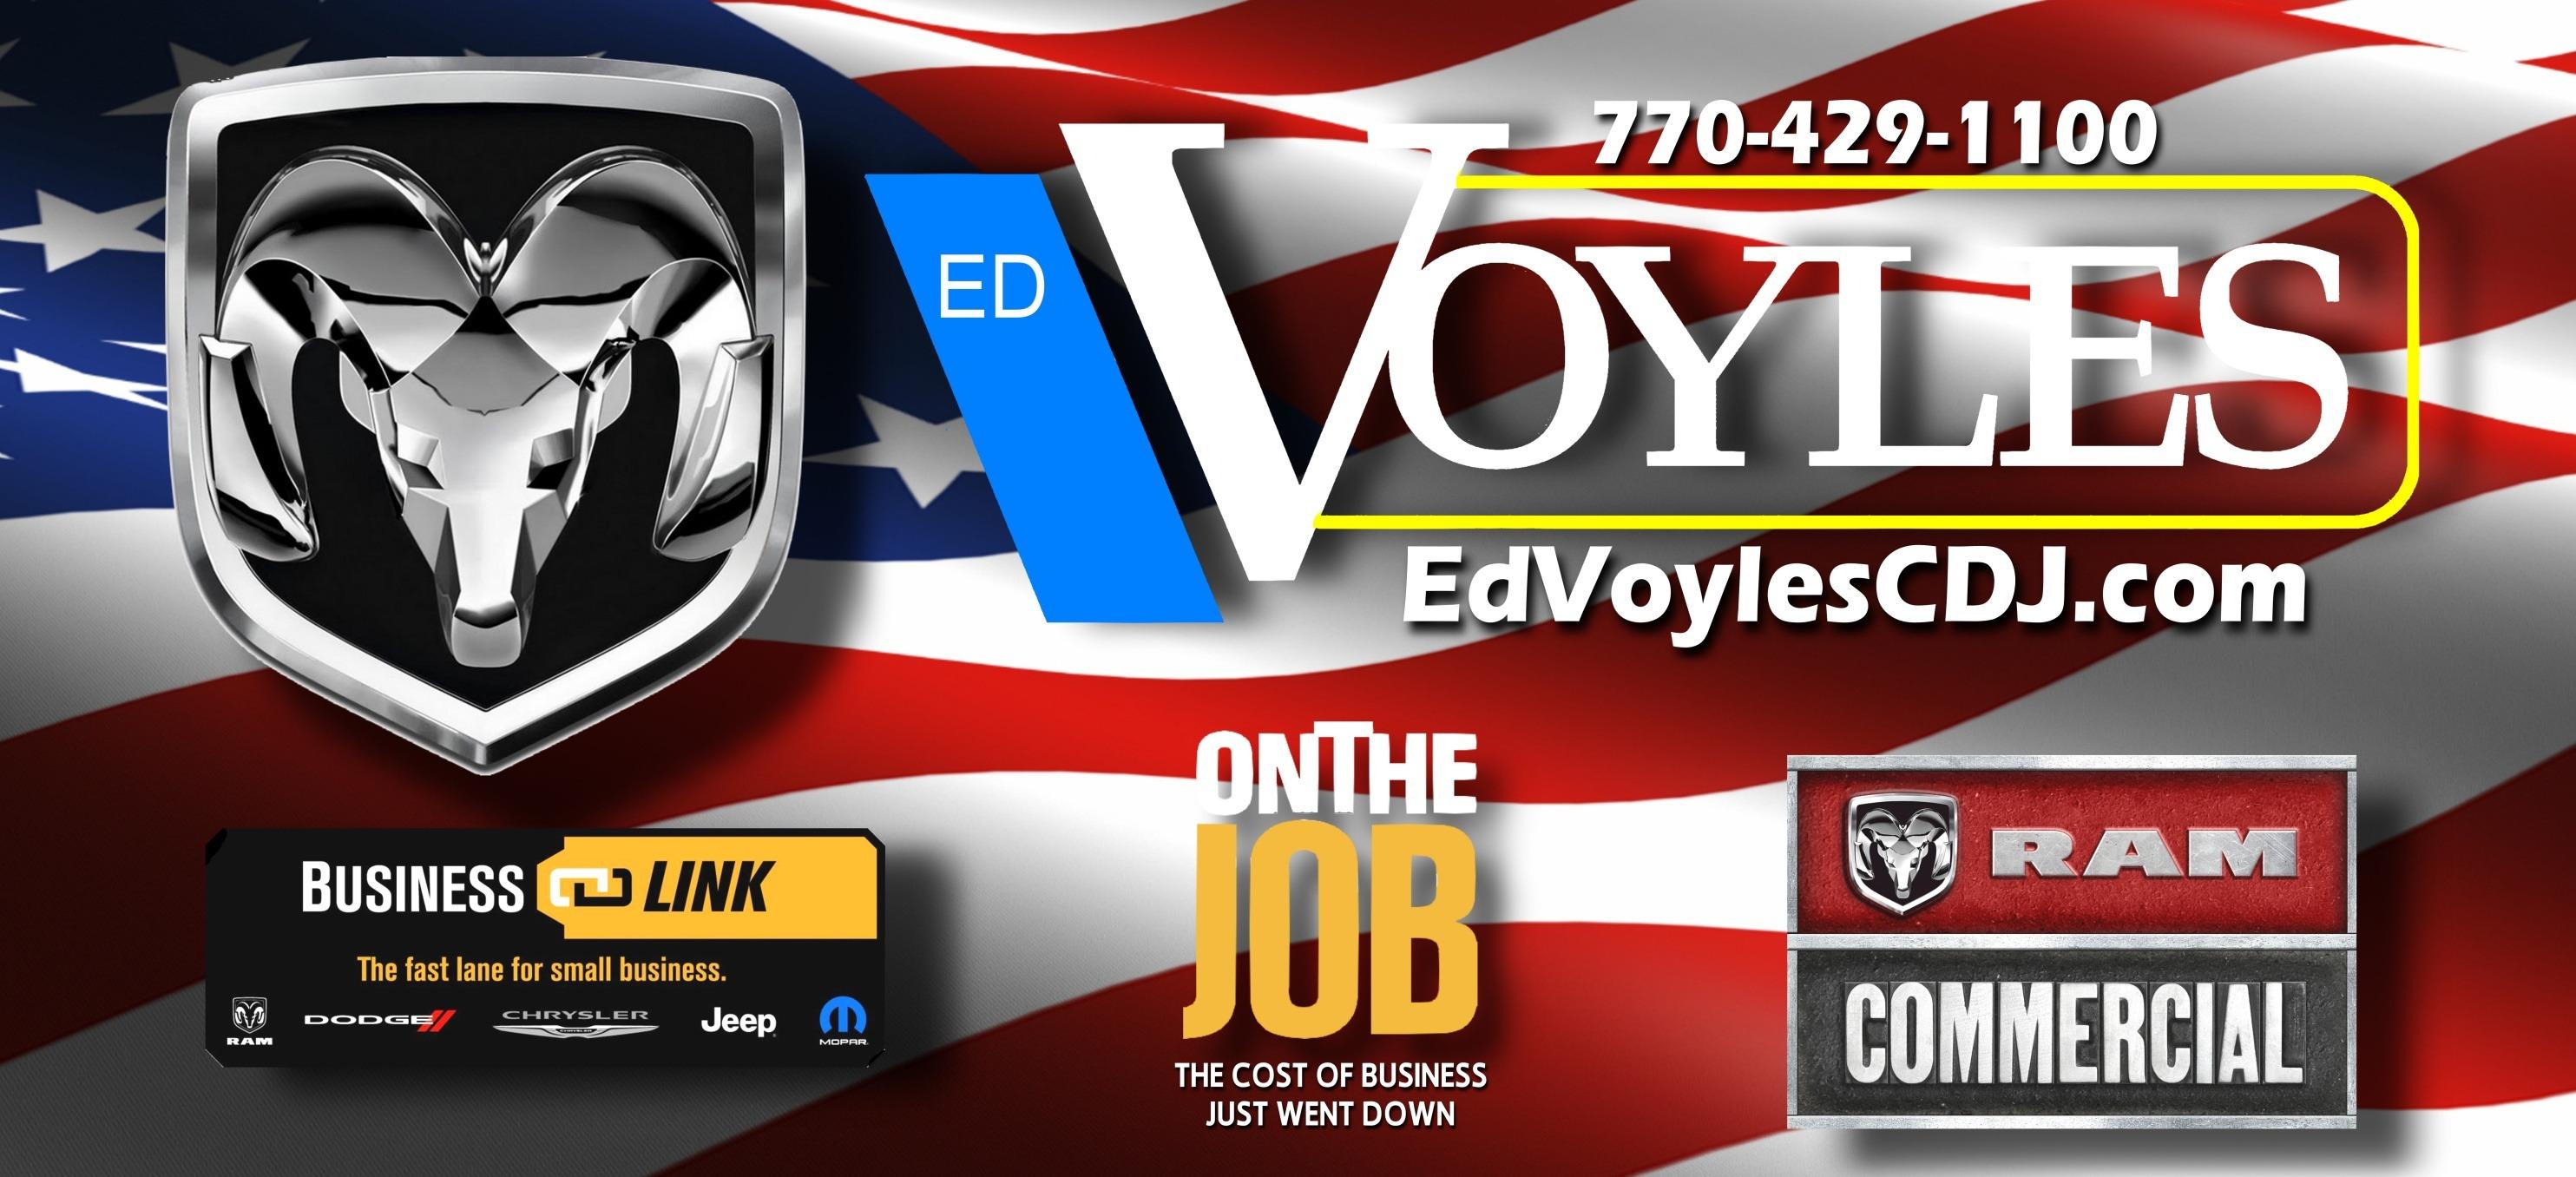 Ed Voyles Fleet and Commercial Center